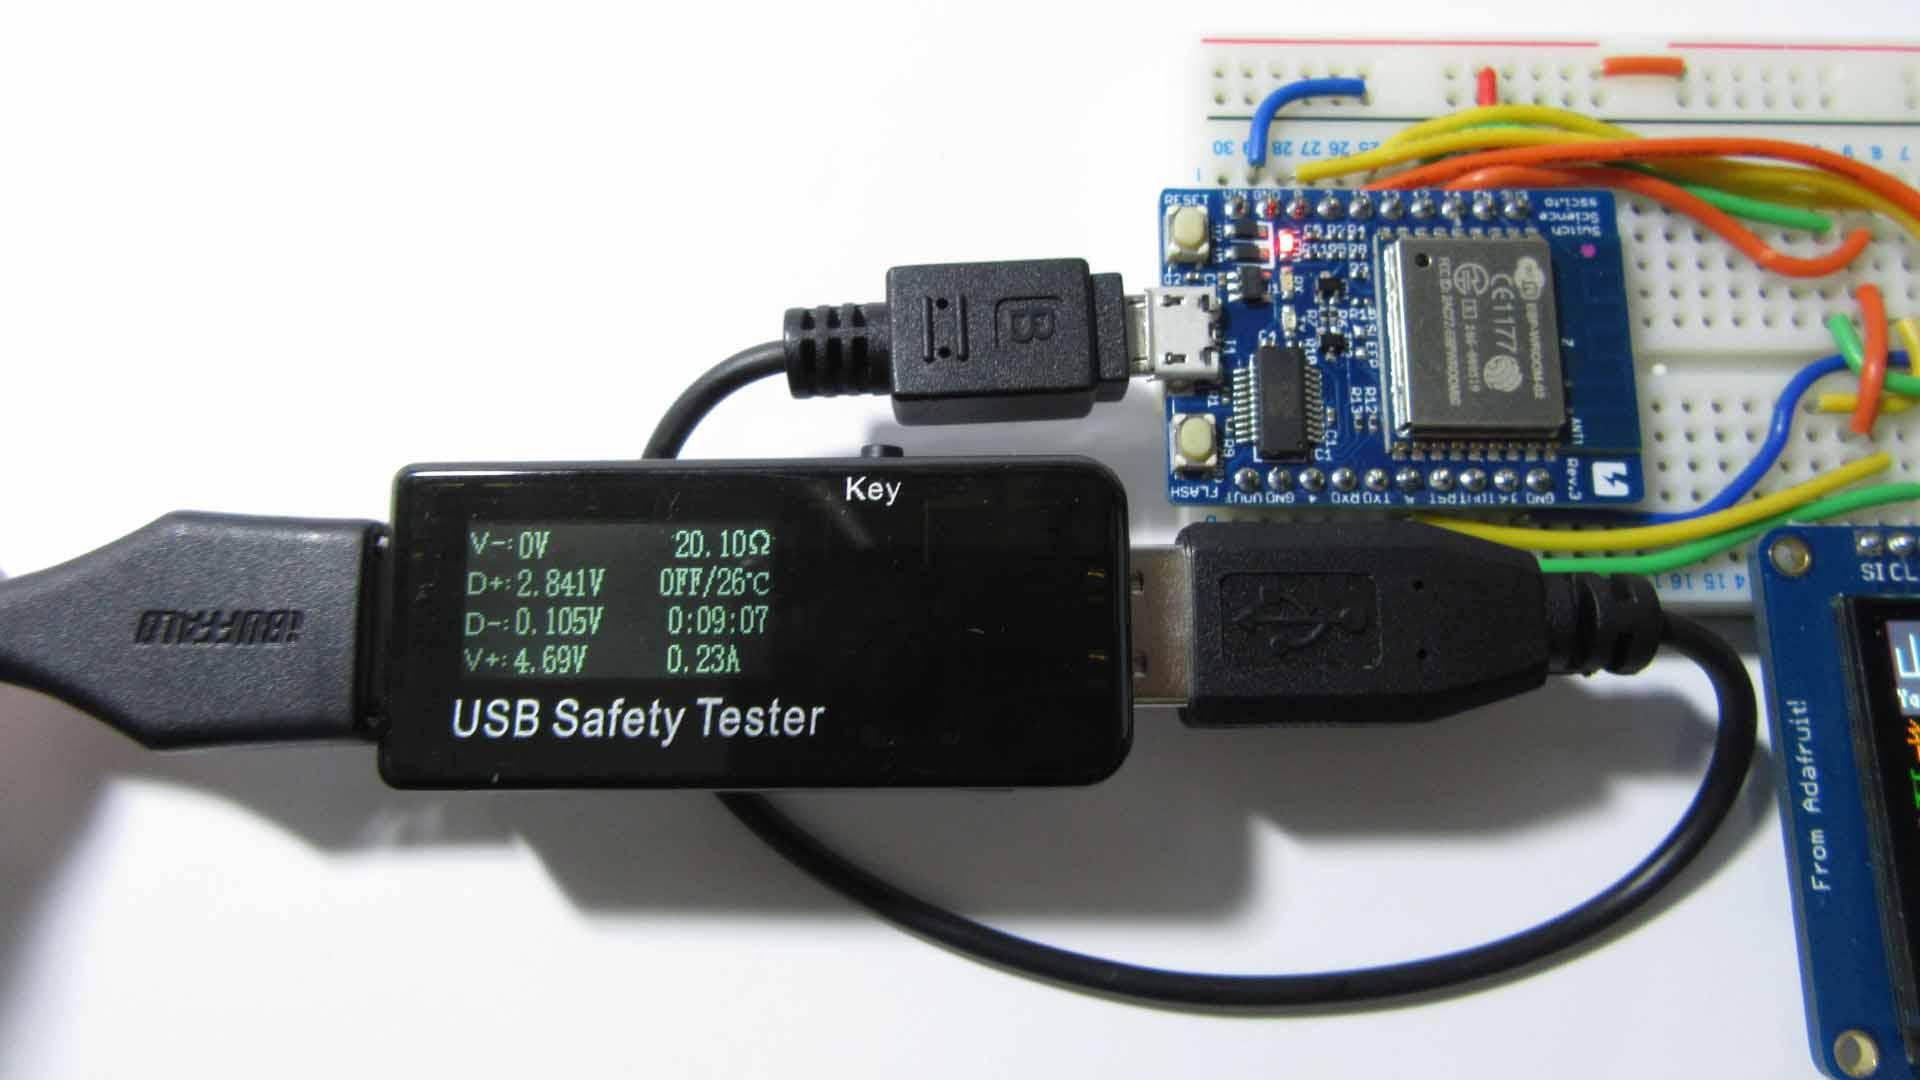 USB Safety Tester ( 電圧 電流 チェッカー ) をレビューしてみました